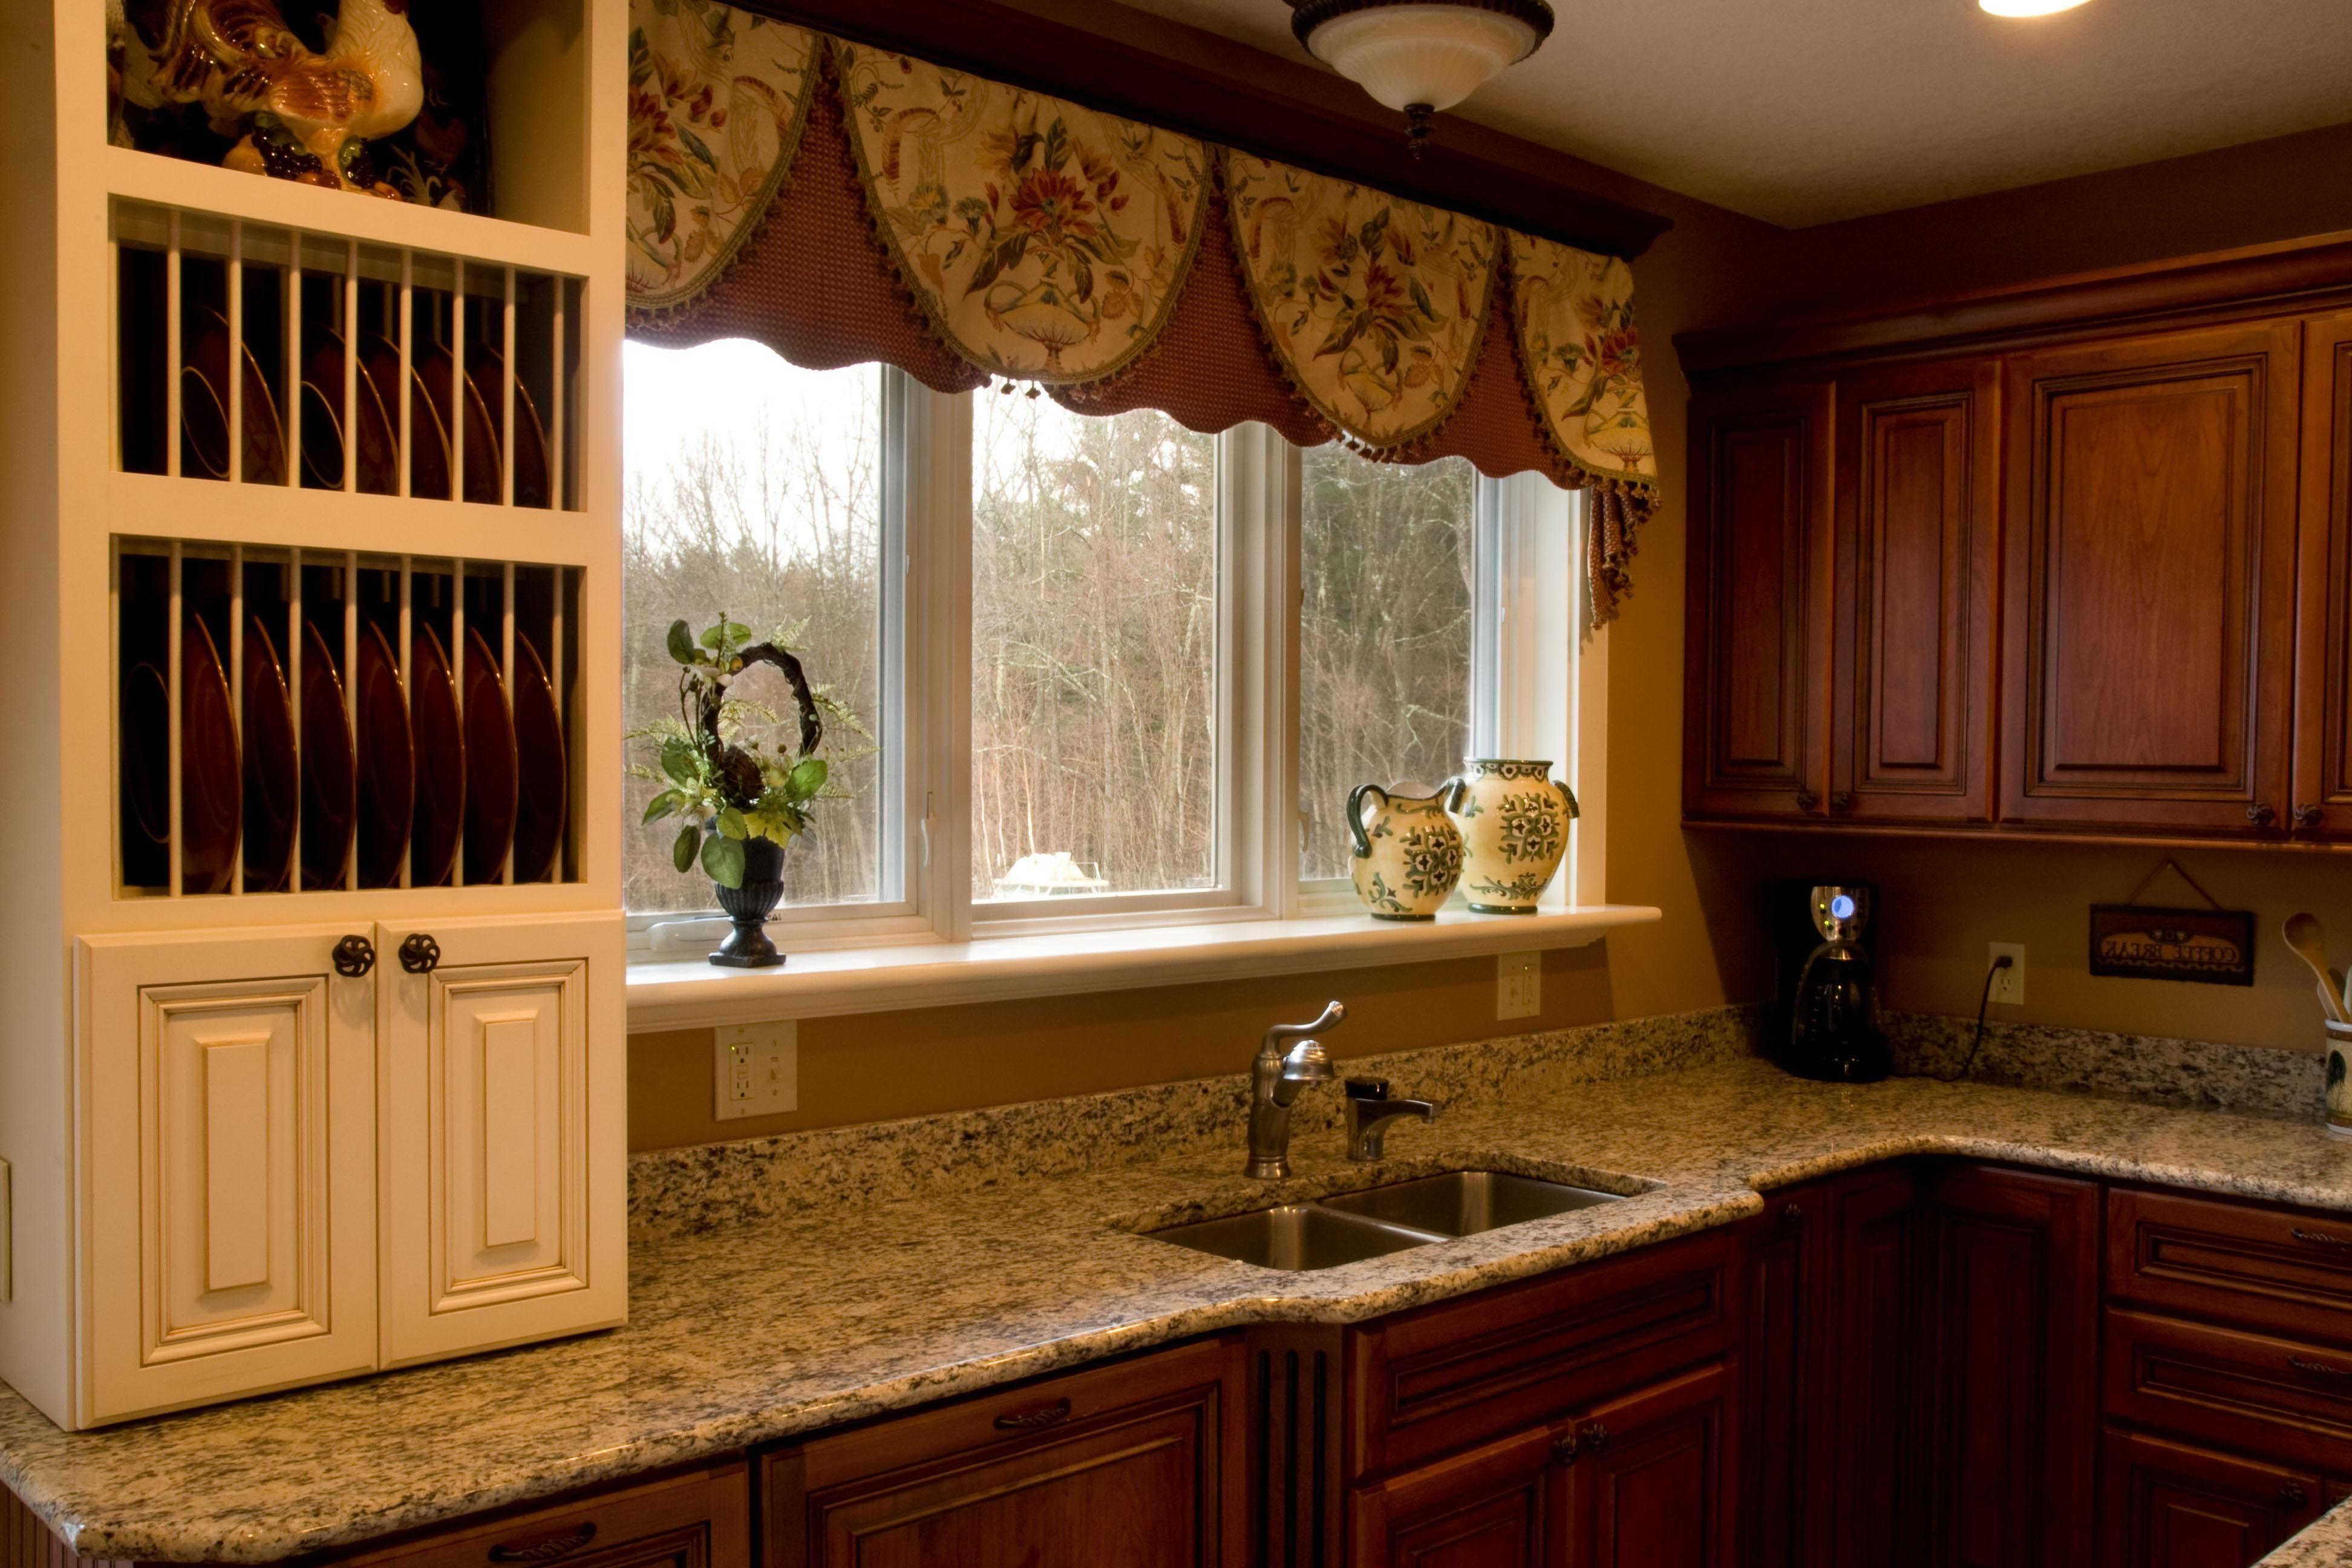 Elegant Kitchen Curtain and also latest kitchen curtains ...